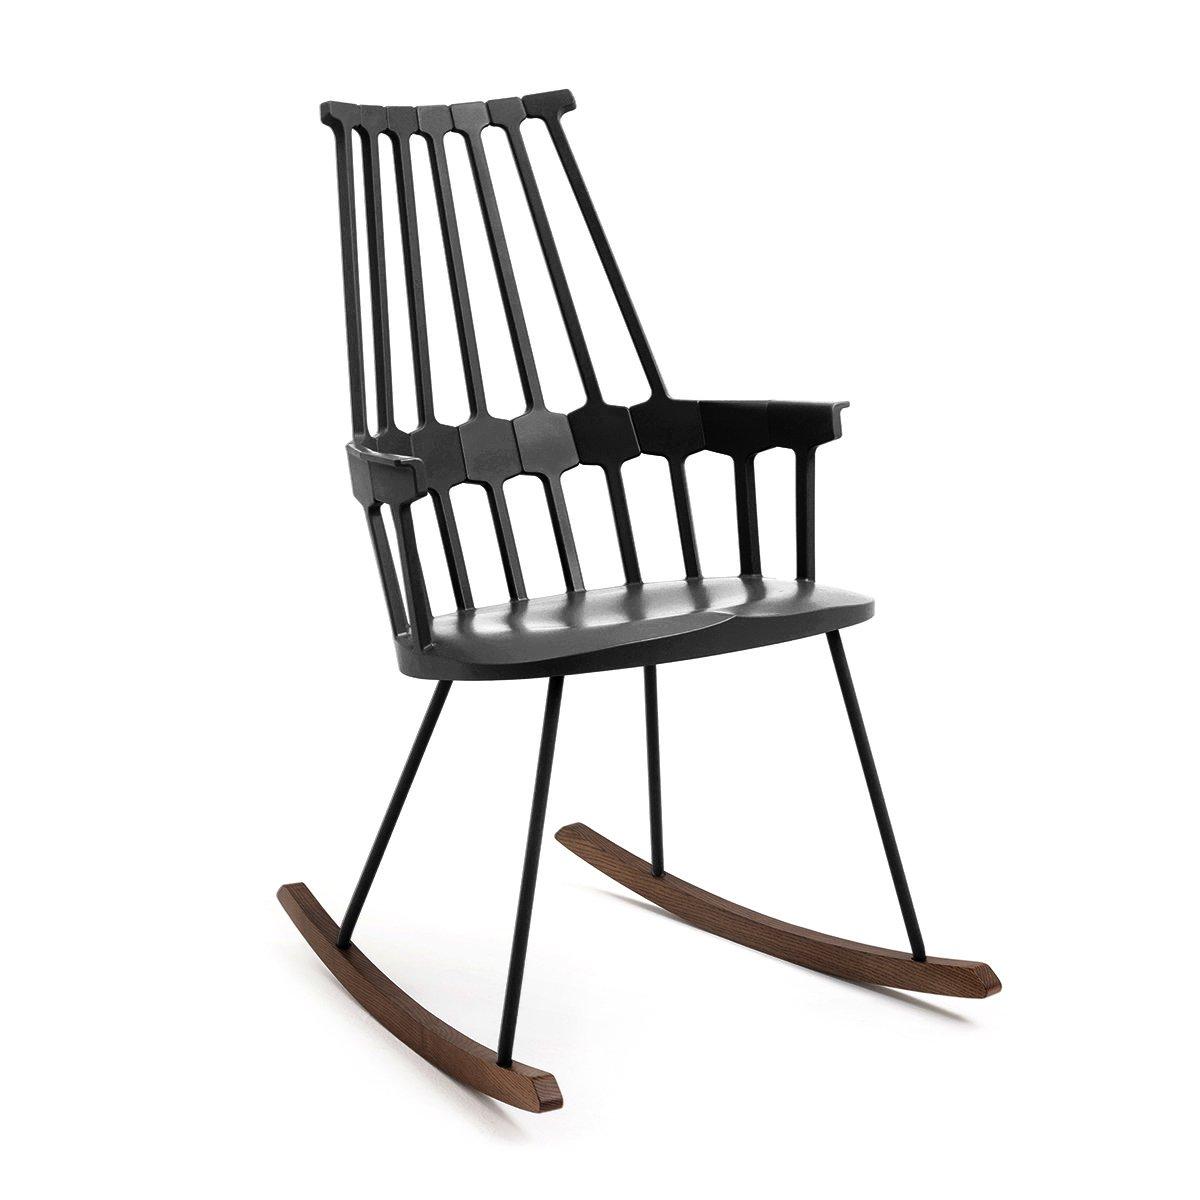 Sensational Kartell Comback Rocking Chair Black Amazon Co Uk Kitchen Forskolin Free Trial Chair Design Images Forskolin Free Trialorg